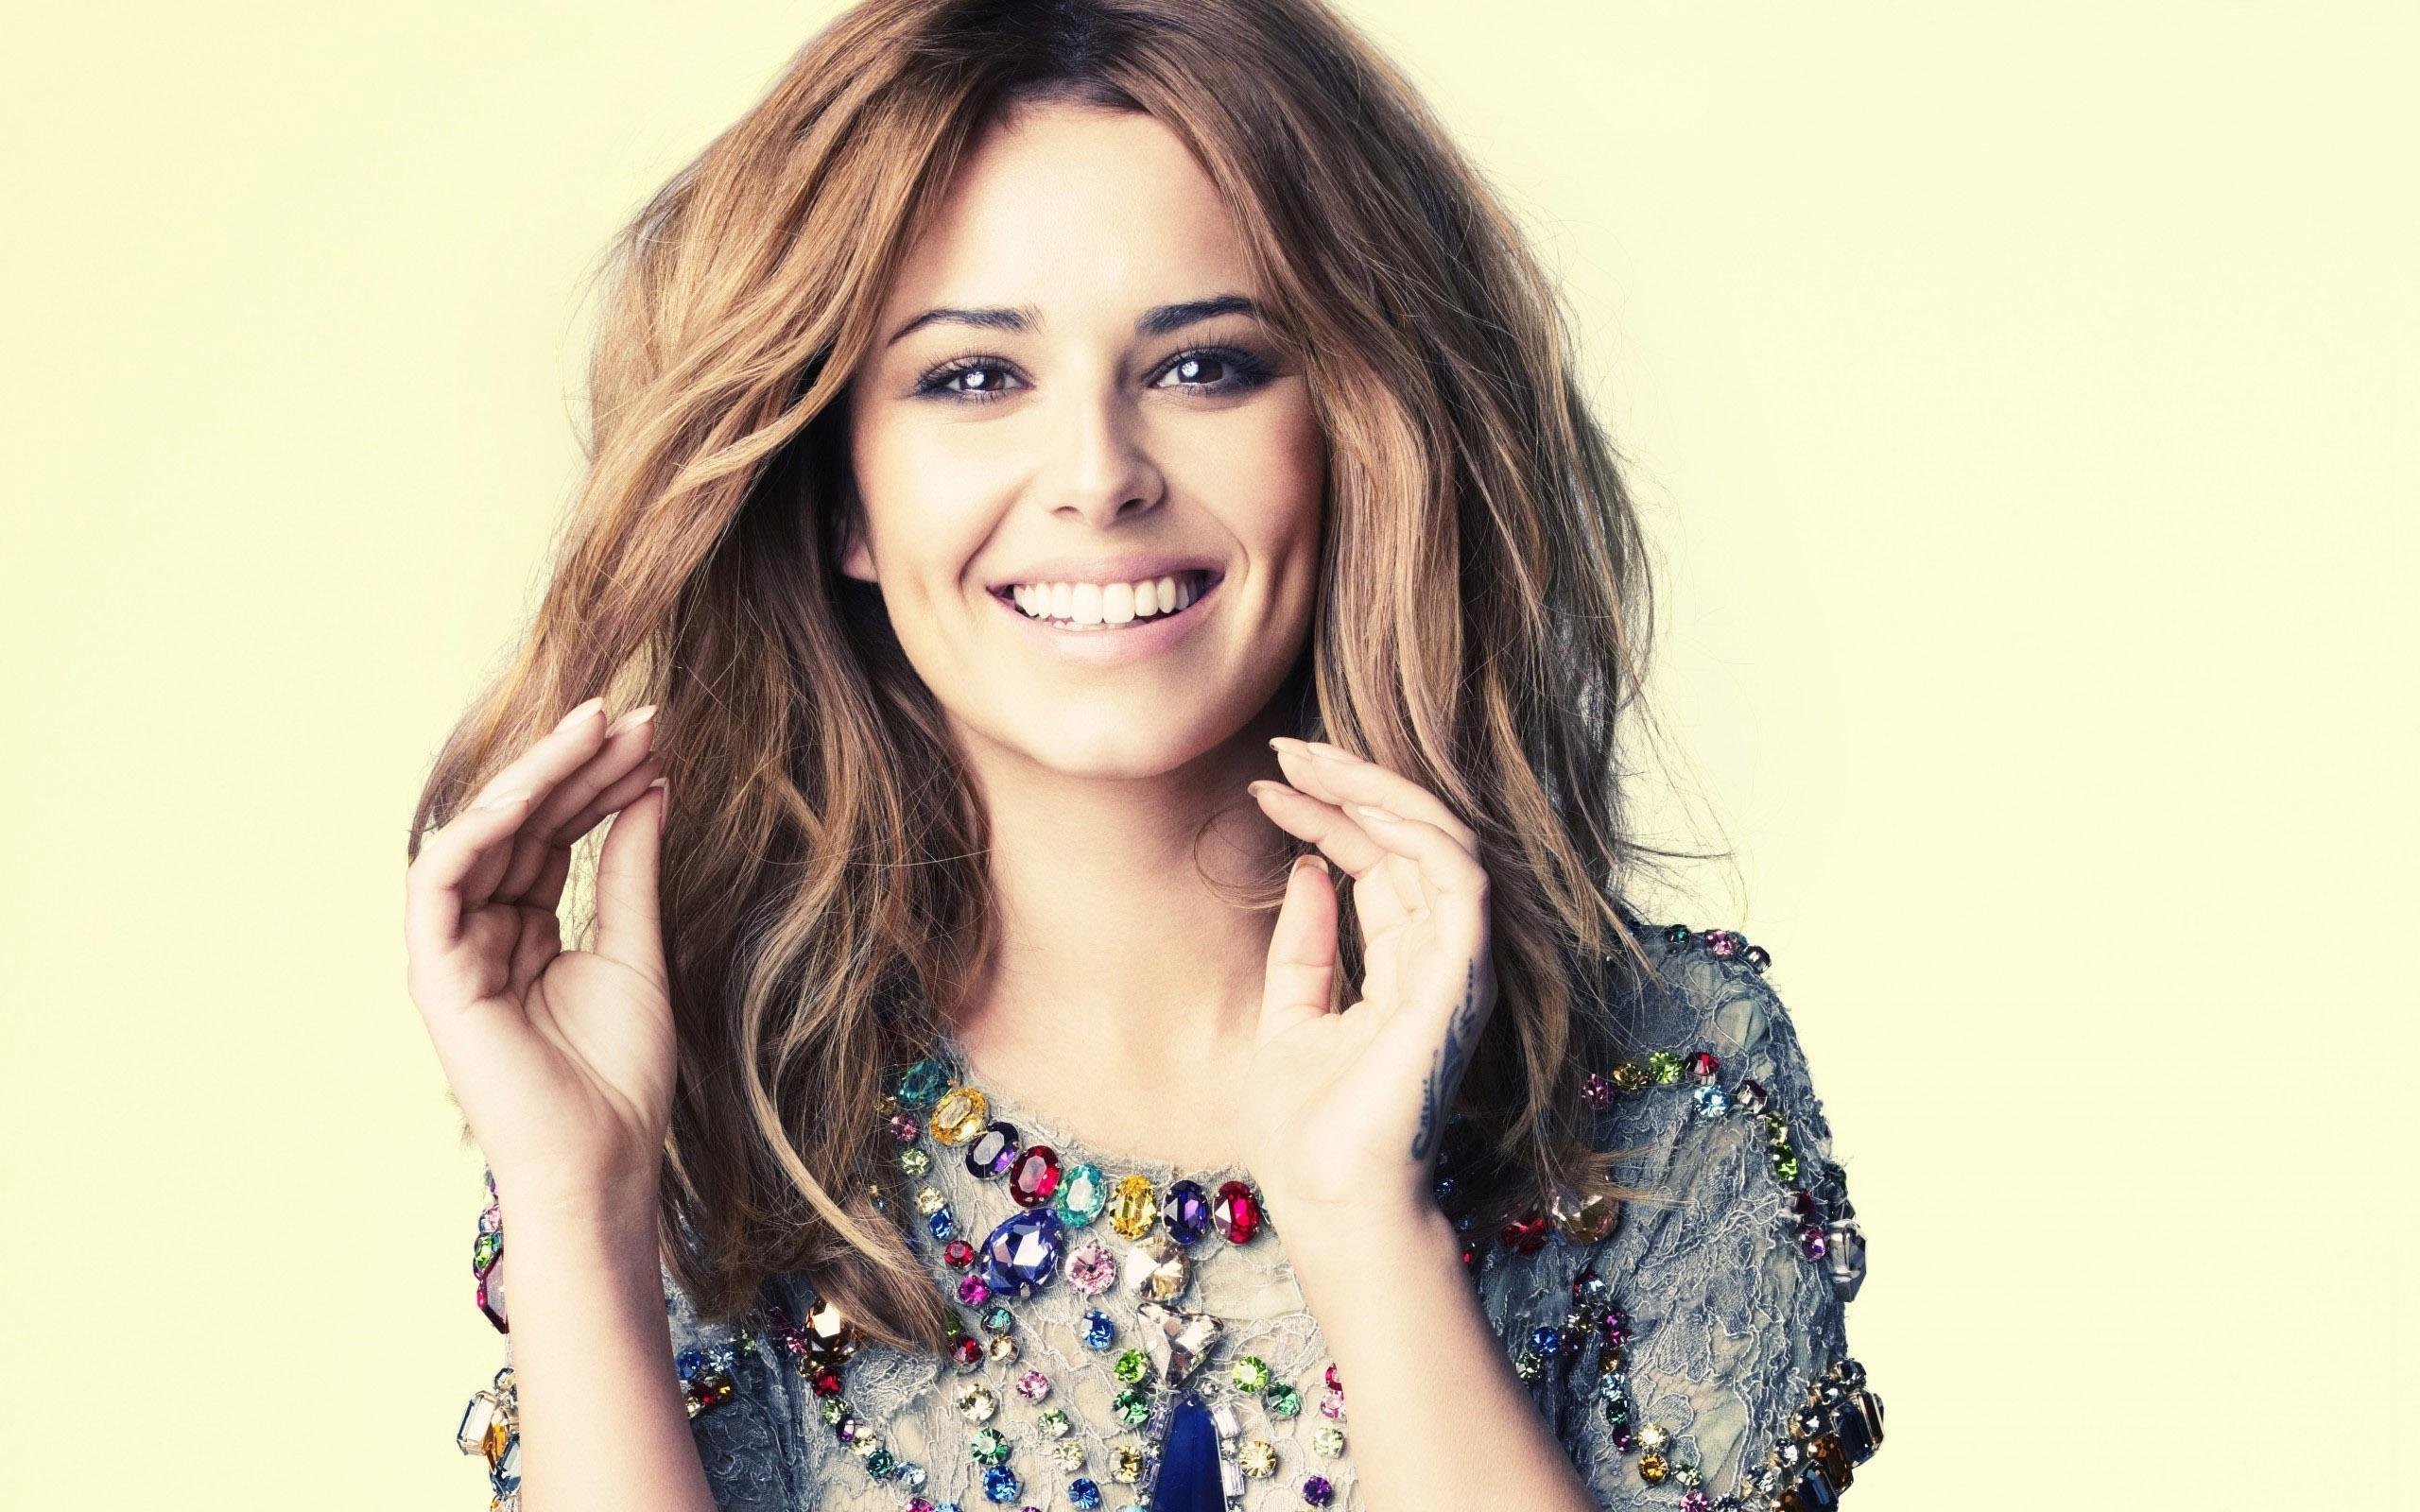 Beautiful Girl Wallpaper Hd 12 24 Beautiful Hd Cheryl Cole Wallpapers